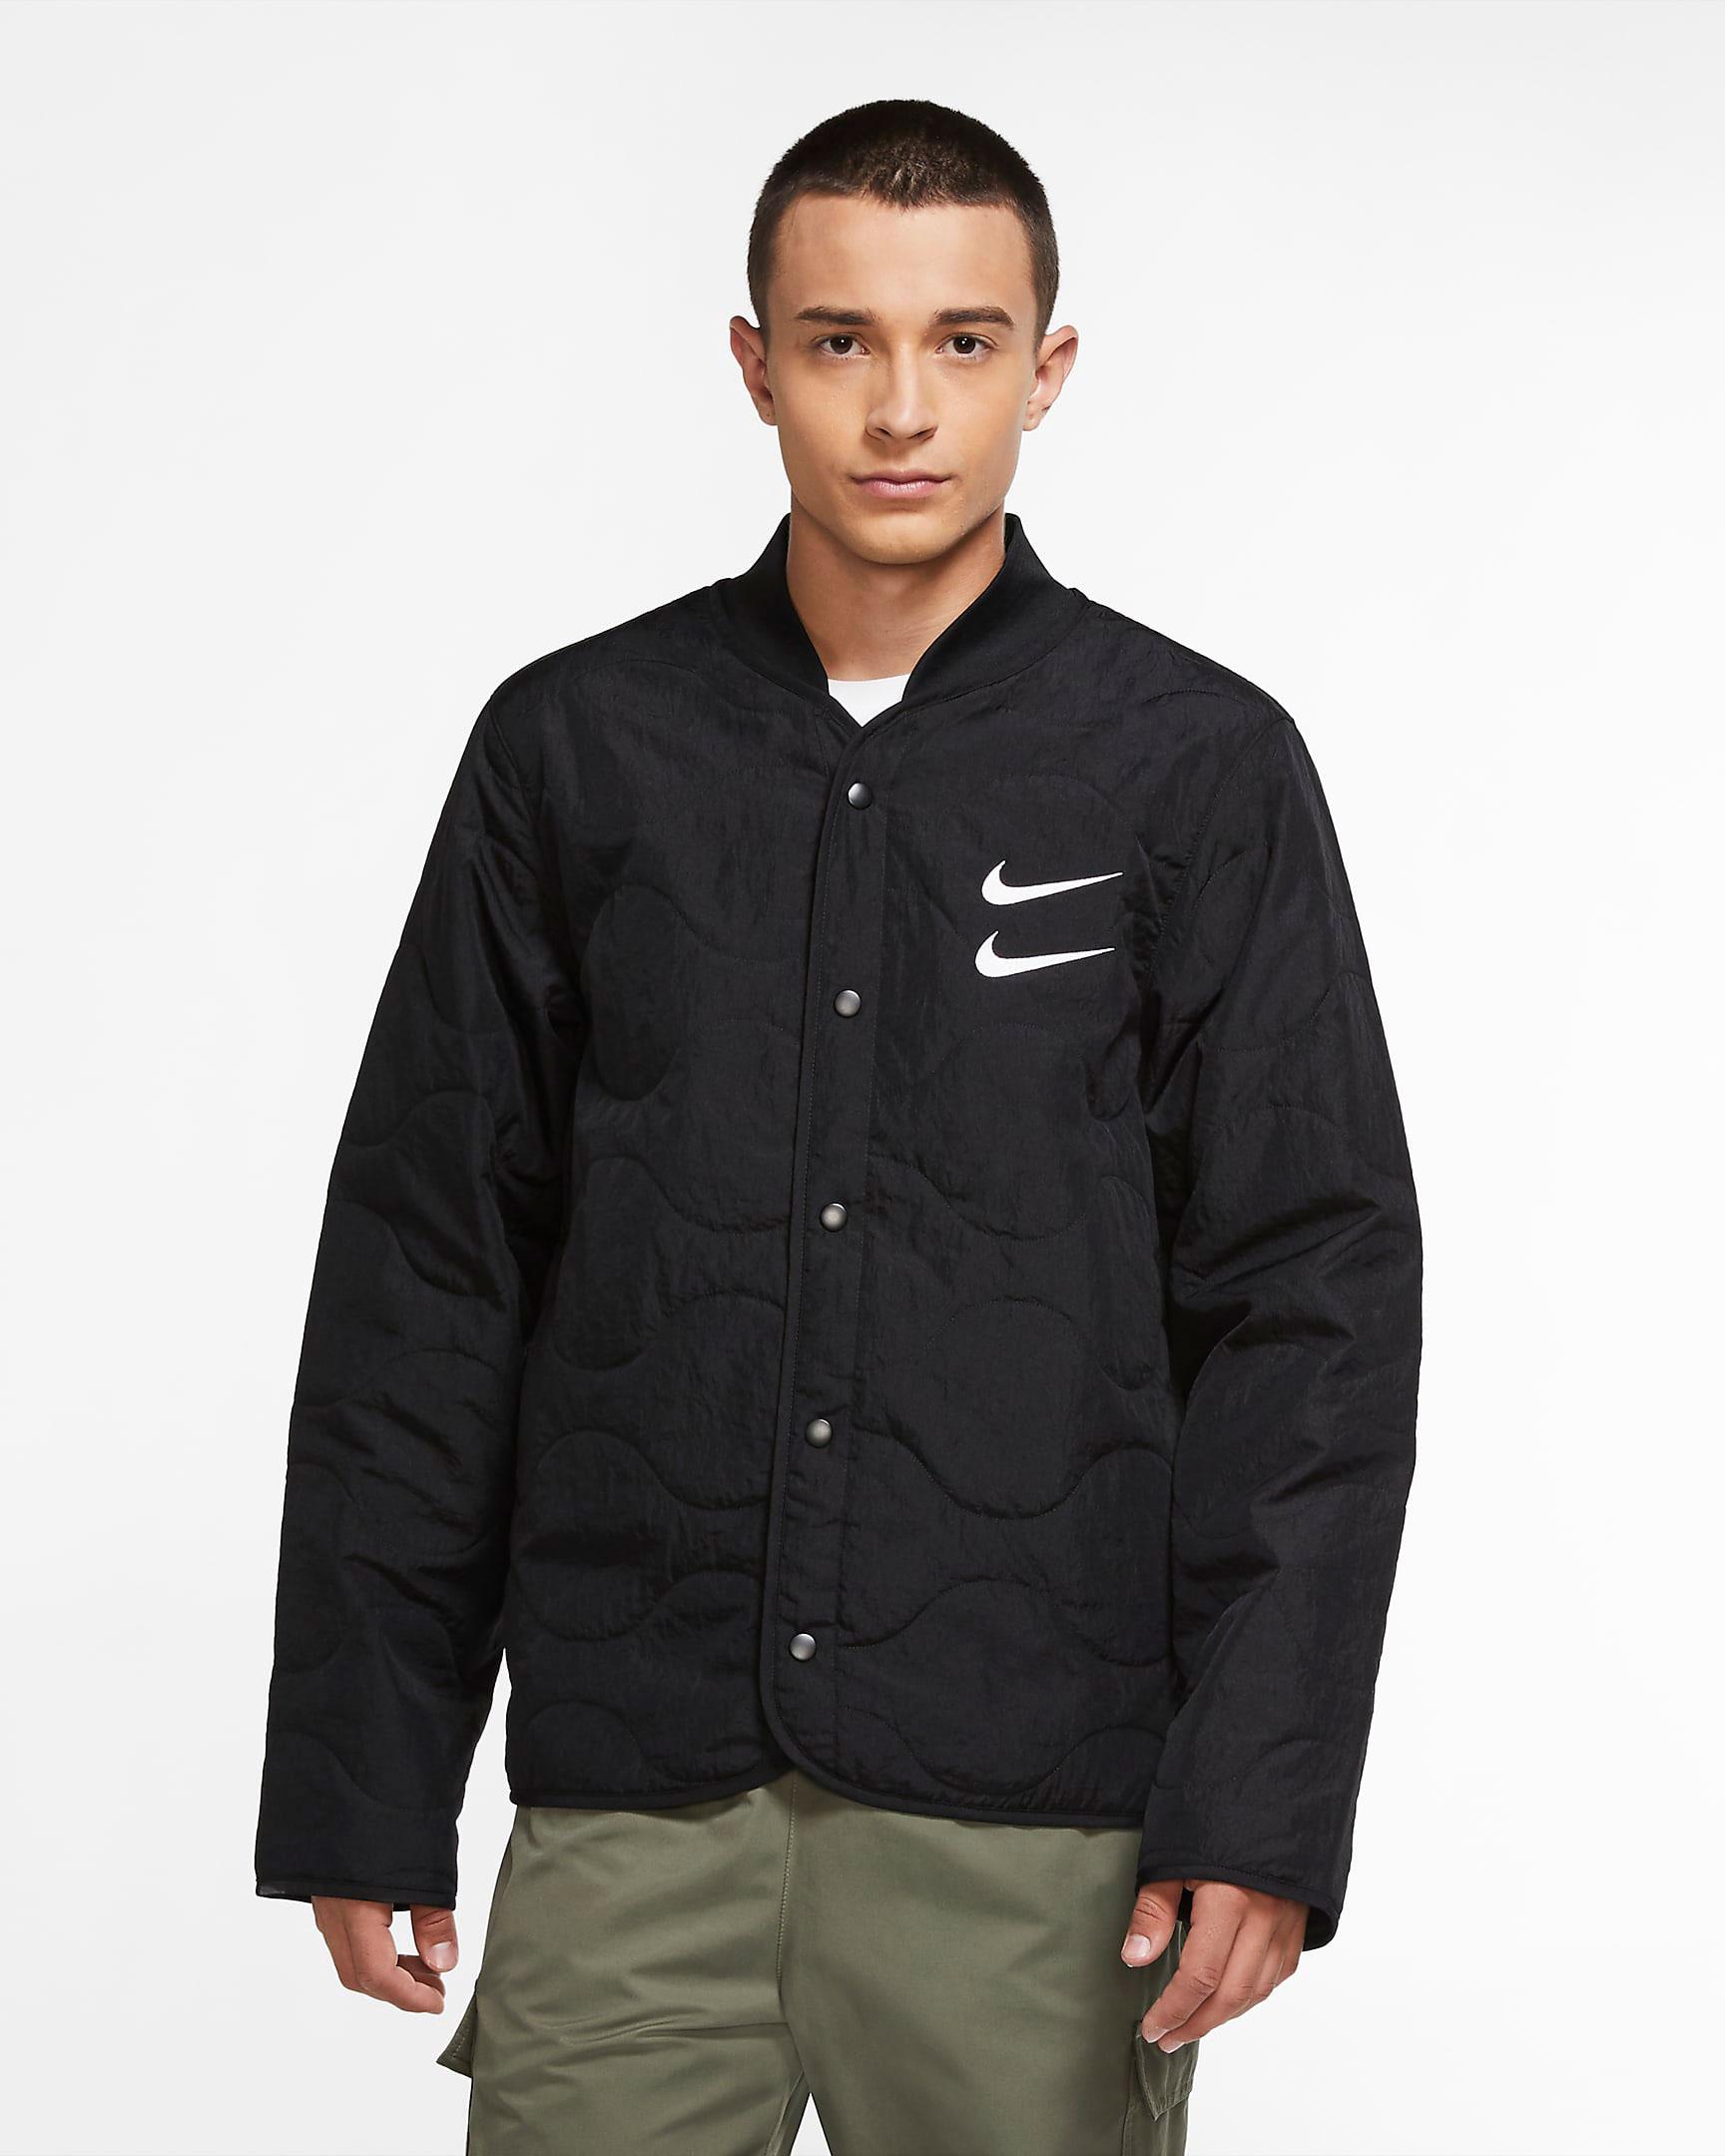 nike-swoosh-quilted-jacket-black-white-1